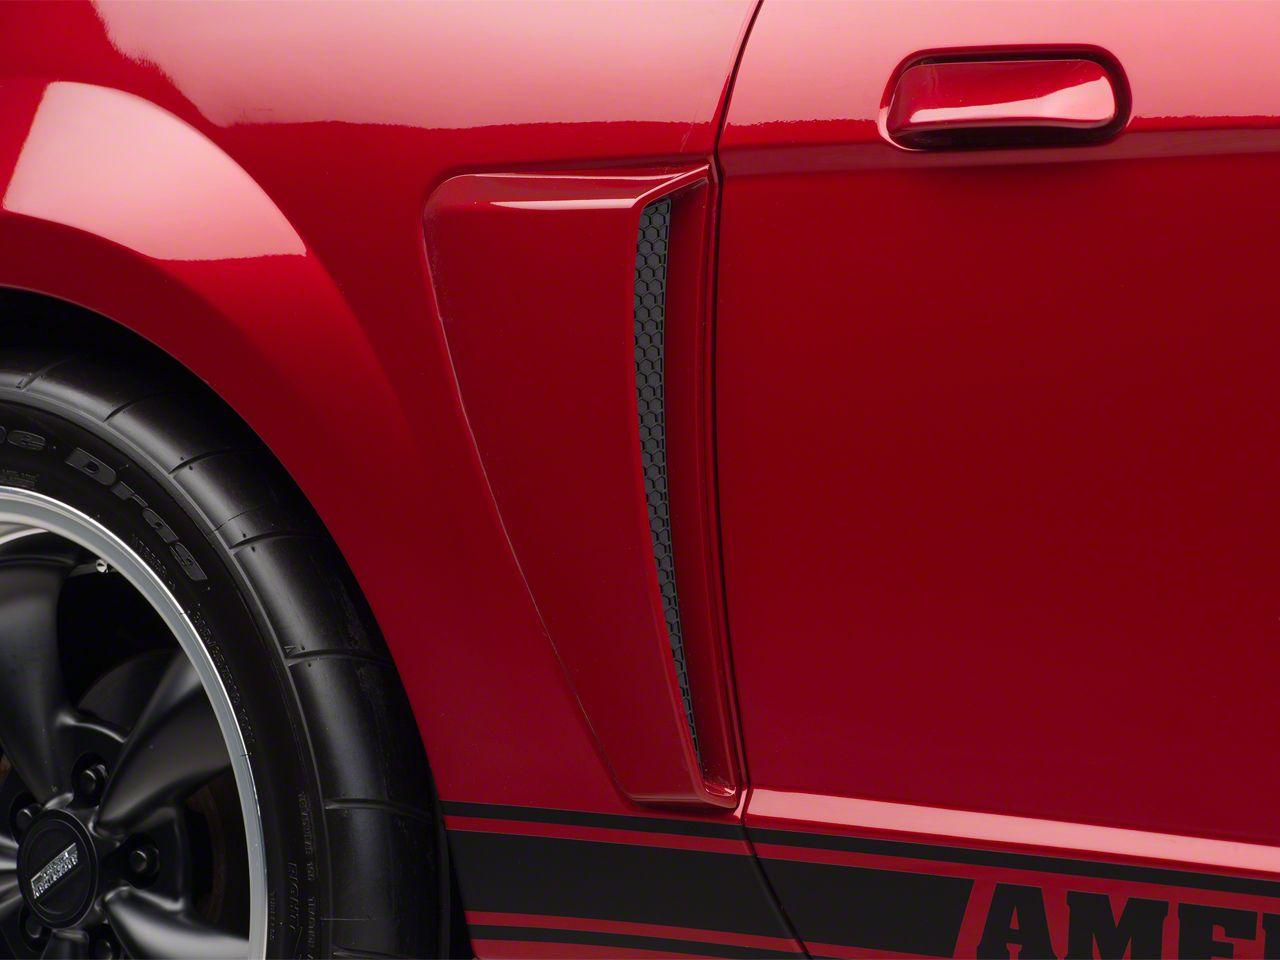 SpeedForm GT Style Side Scoops - Unpainted (99-04 All)